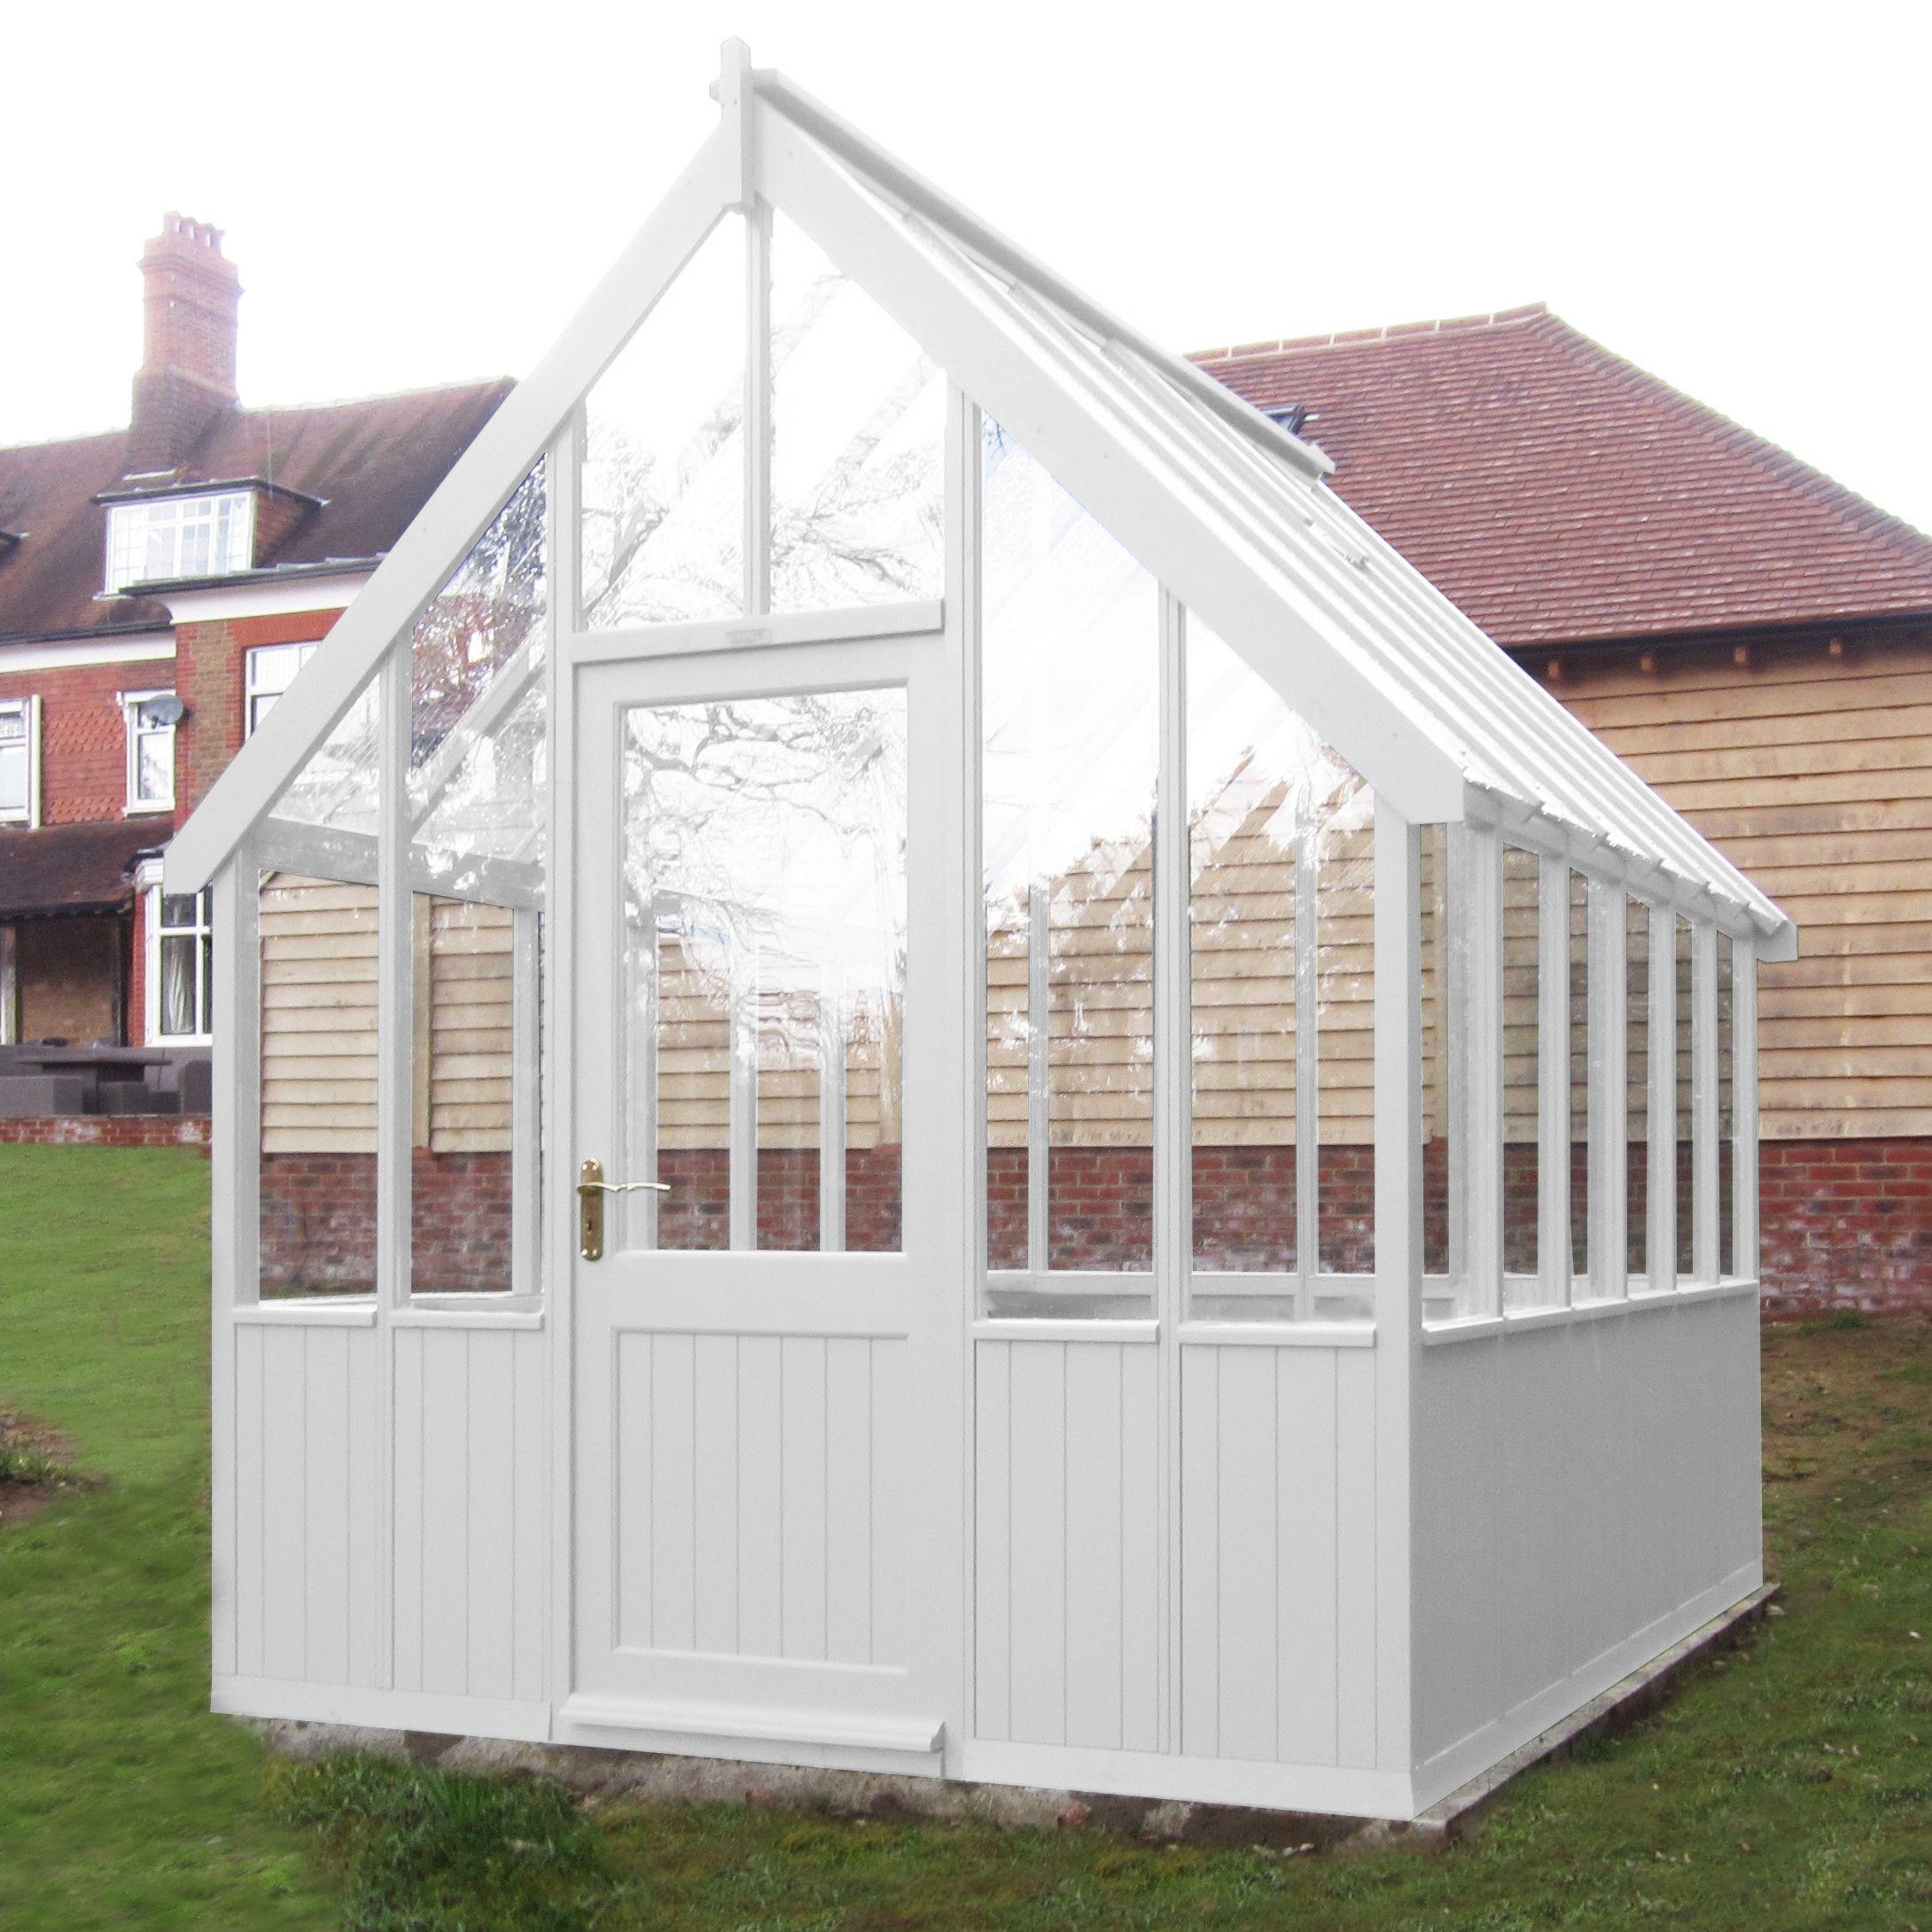 Crane Crane 1.8 x 2.4m Greenhouse, FSC-certified (Scandinavian Redwood)